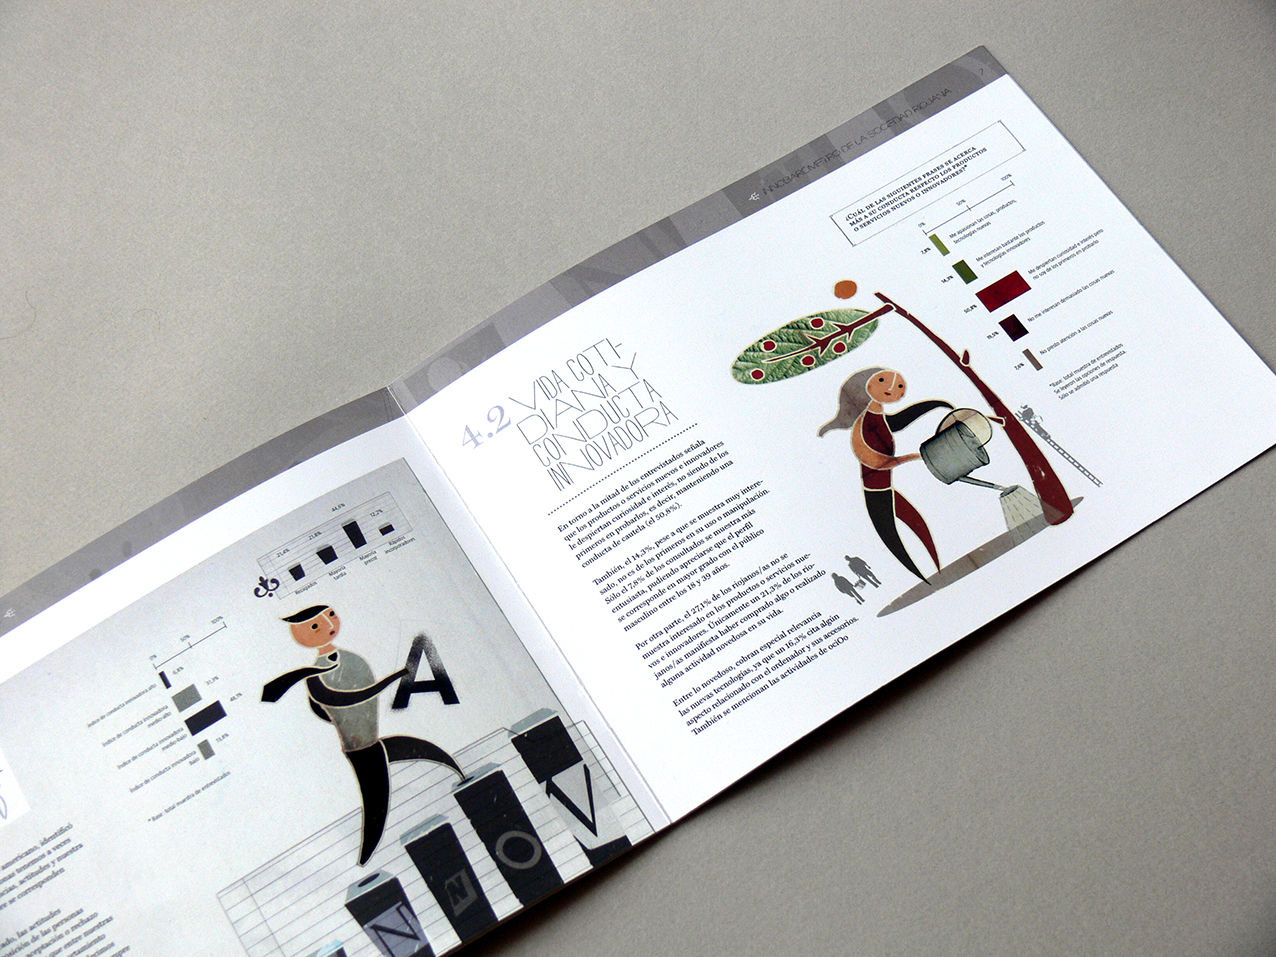 diseno-editorial-ilustracion-interiores-innovacion